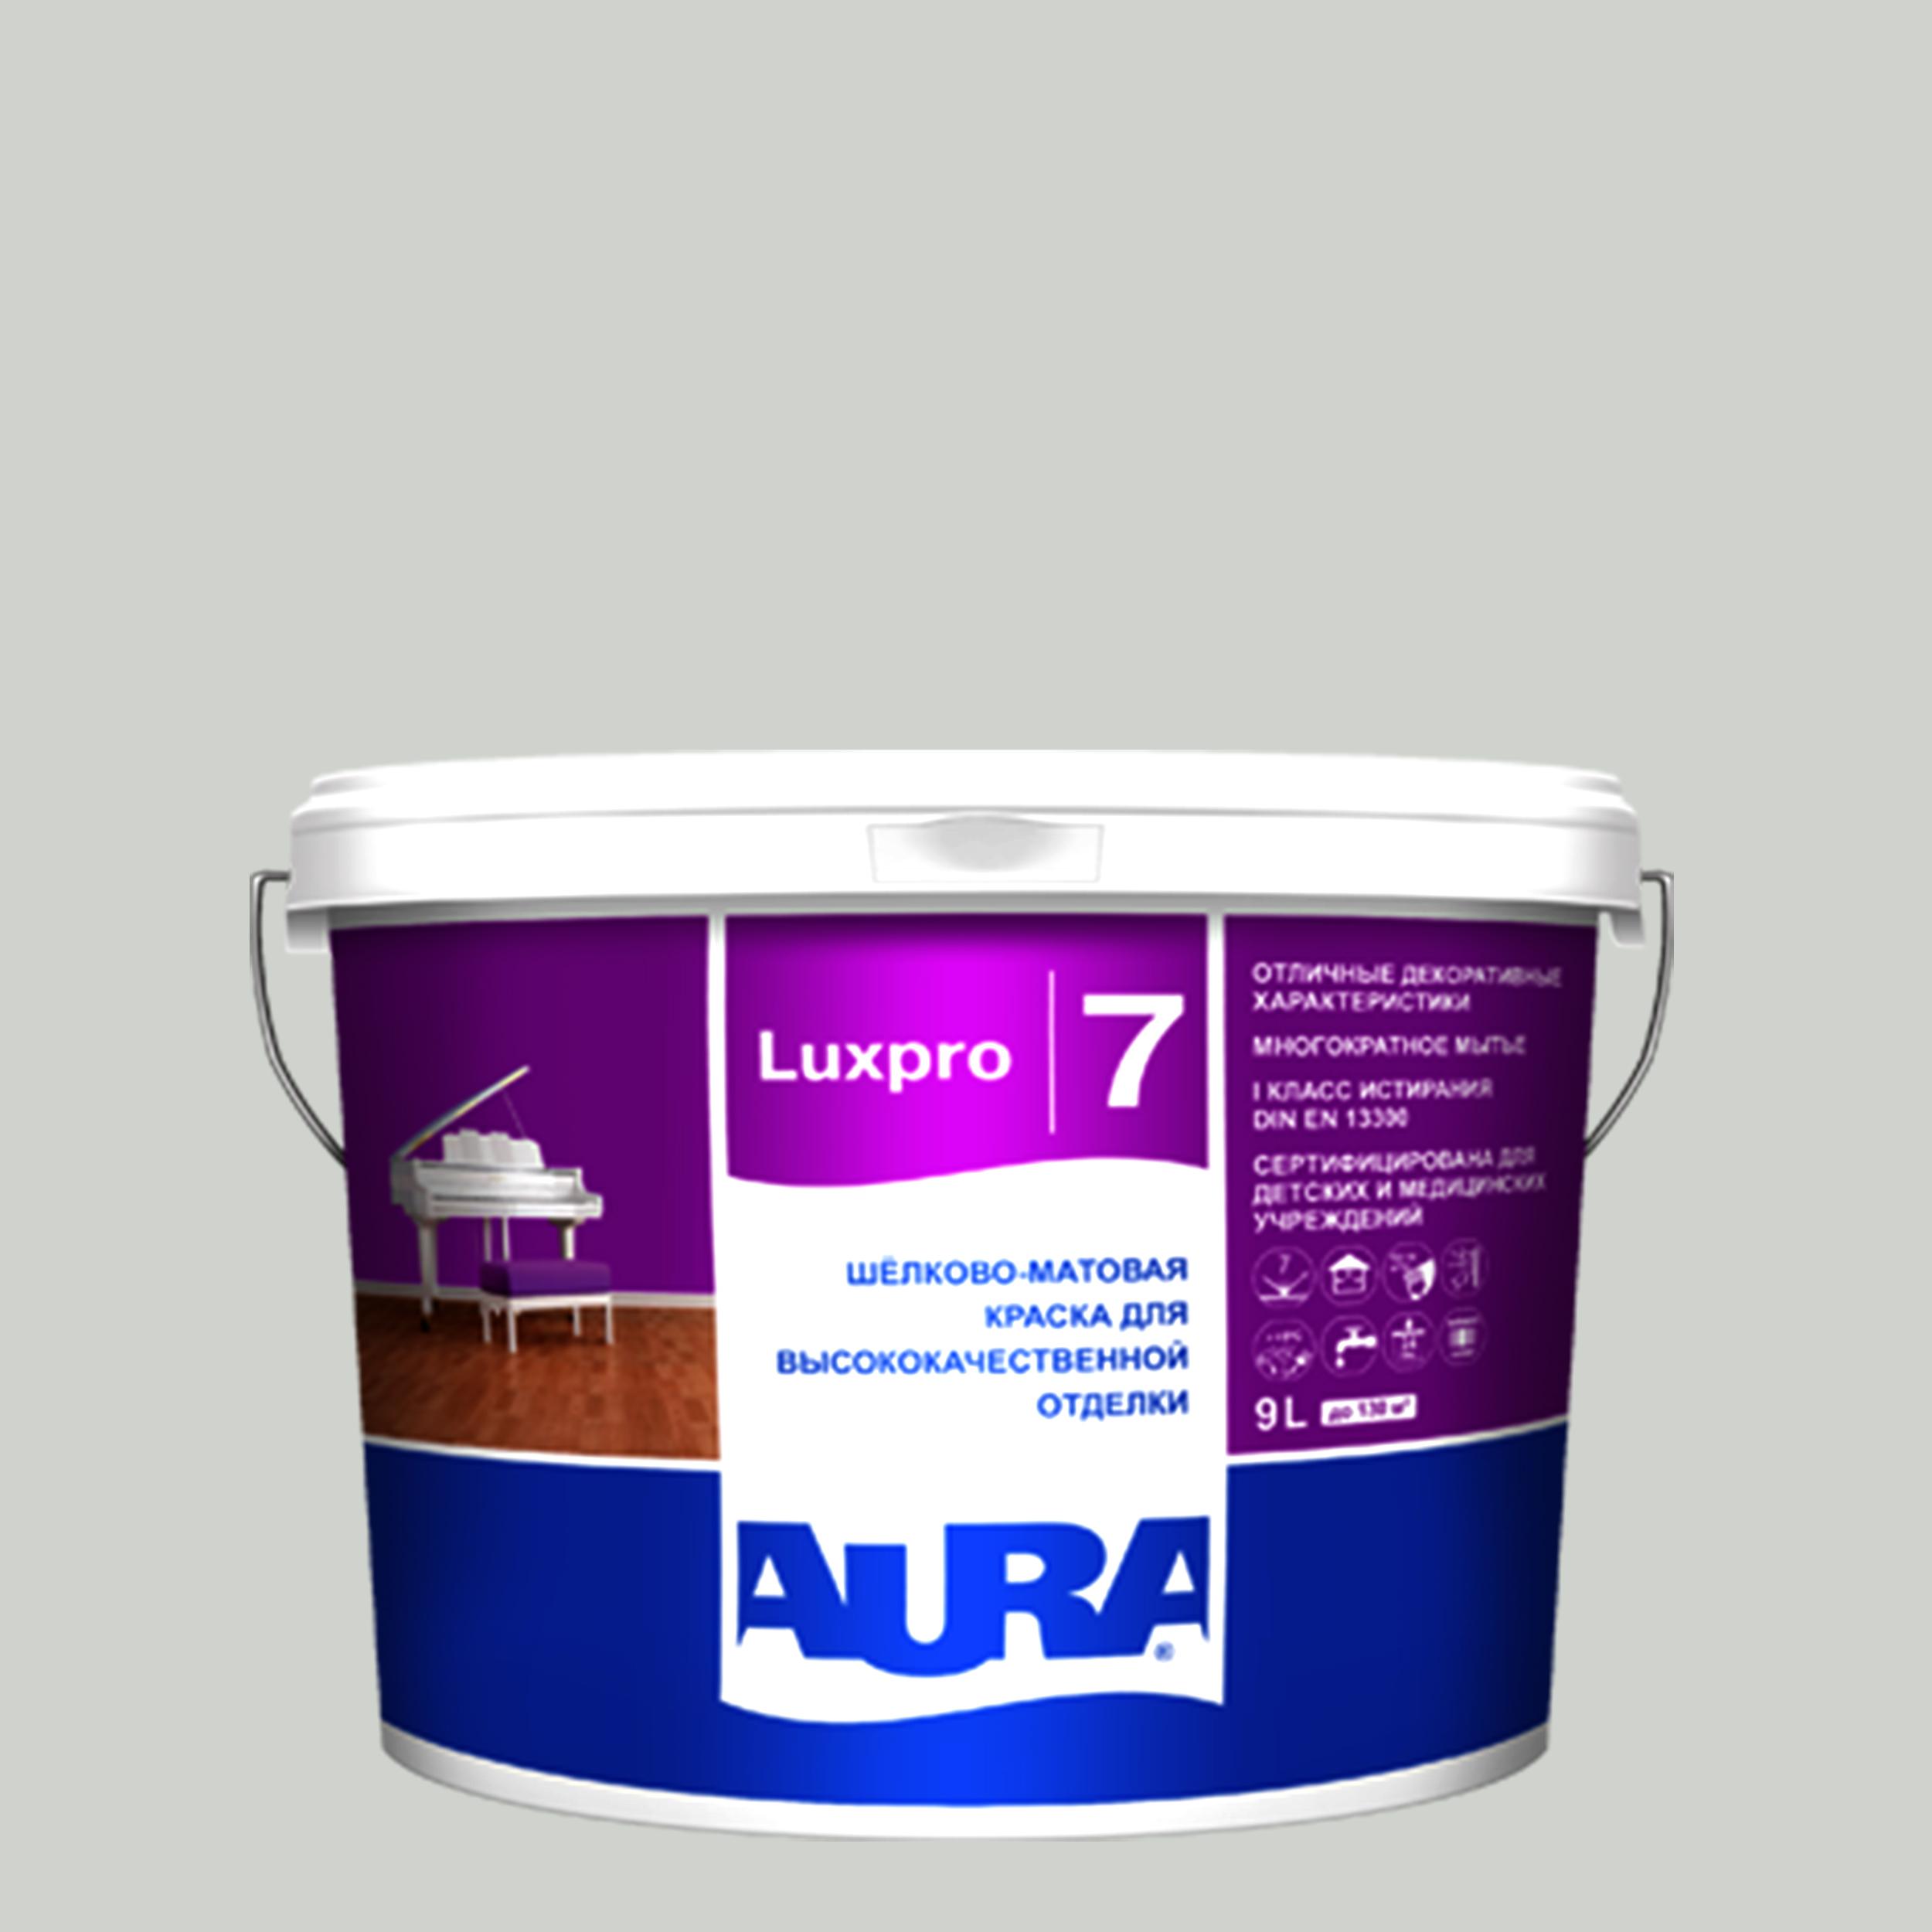 Фото 5 - Краска интерьерная, Aura LuxPRO 7, RAL 1017, 11 кг.